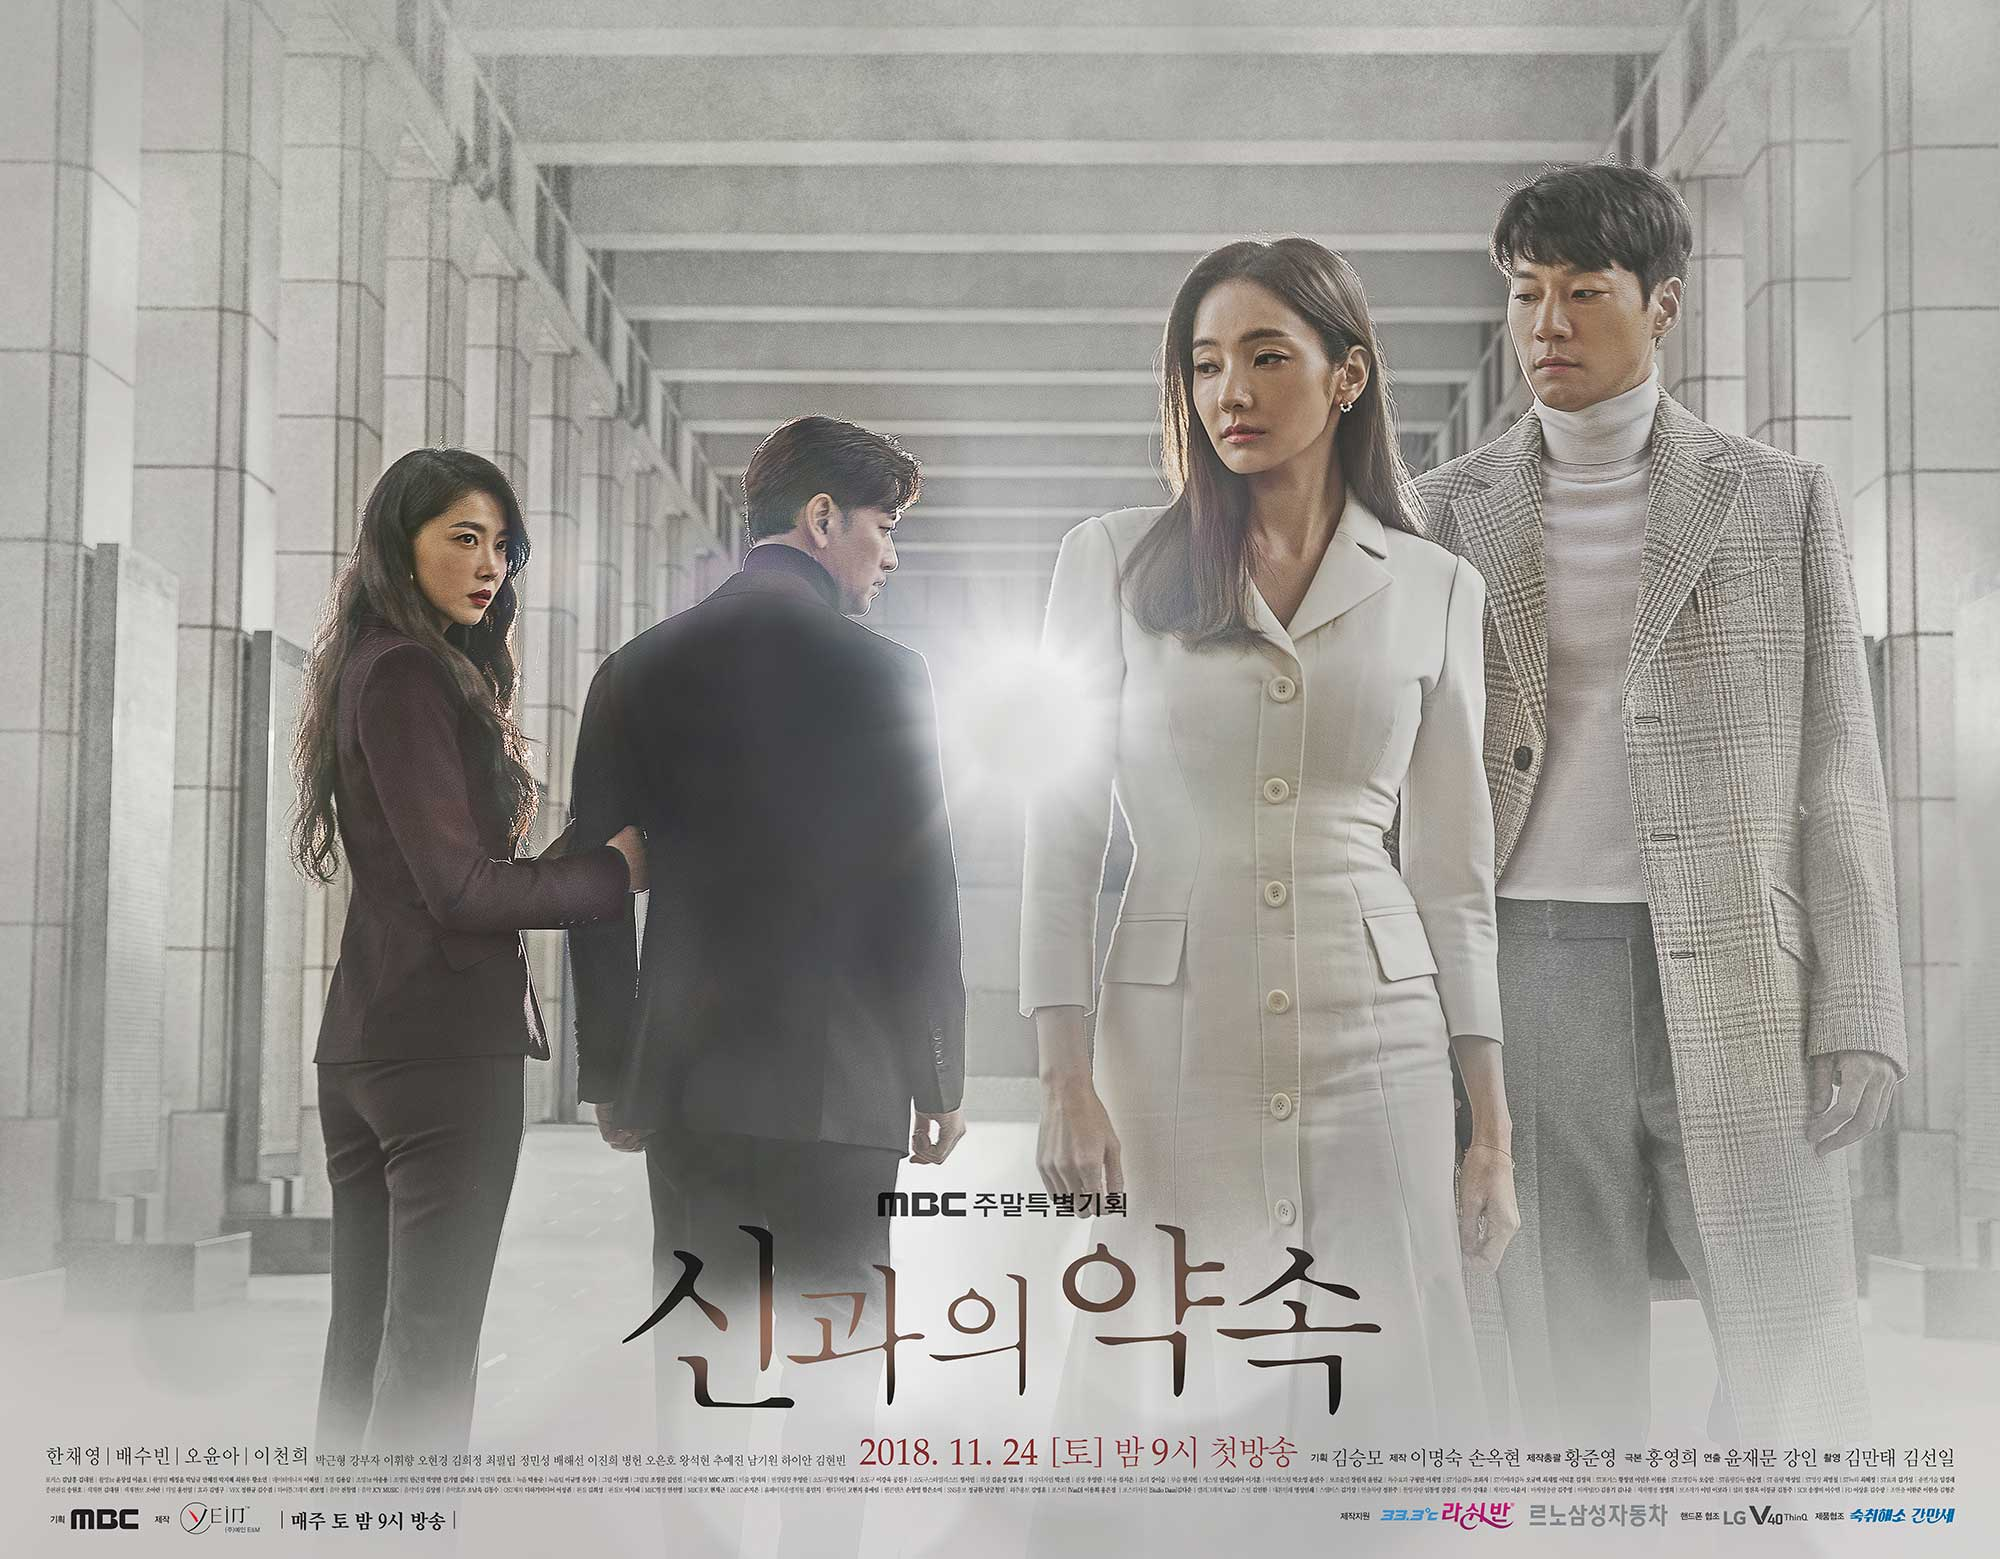 MBC 신과의 약속 포스터